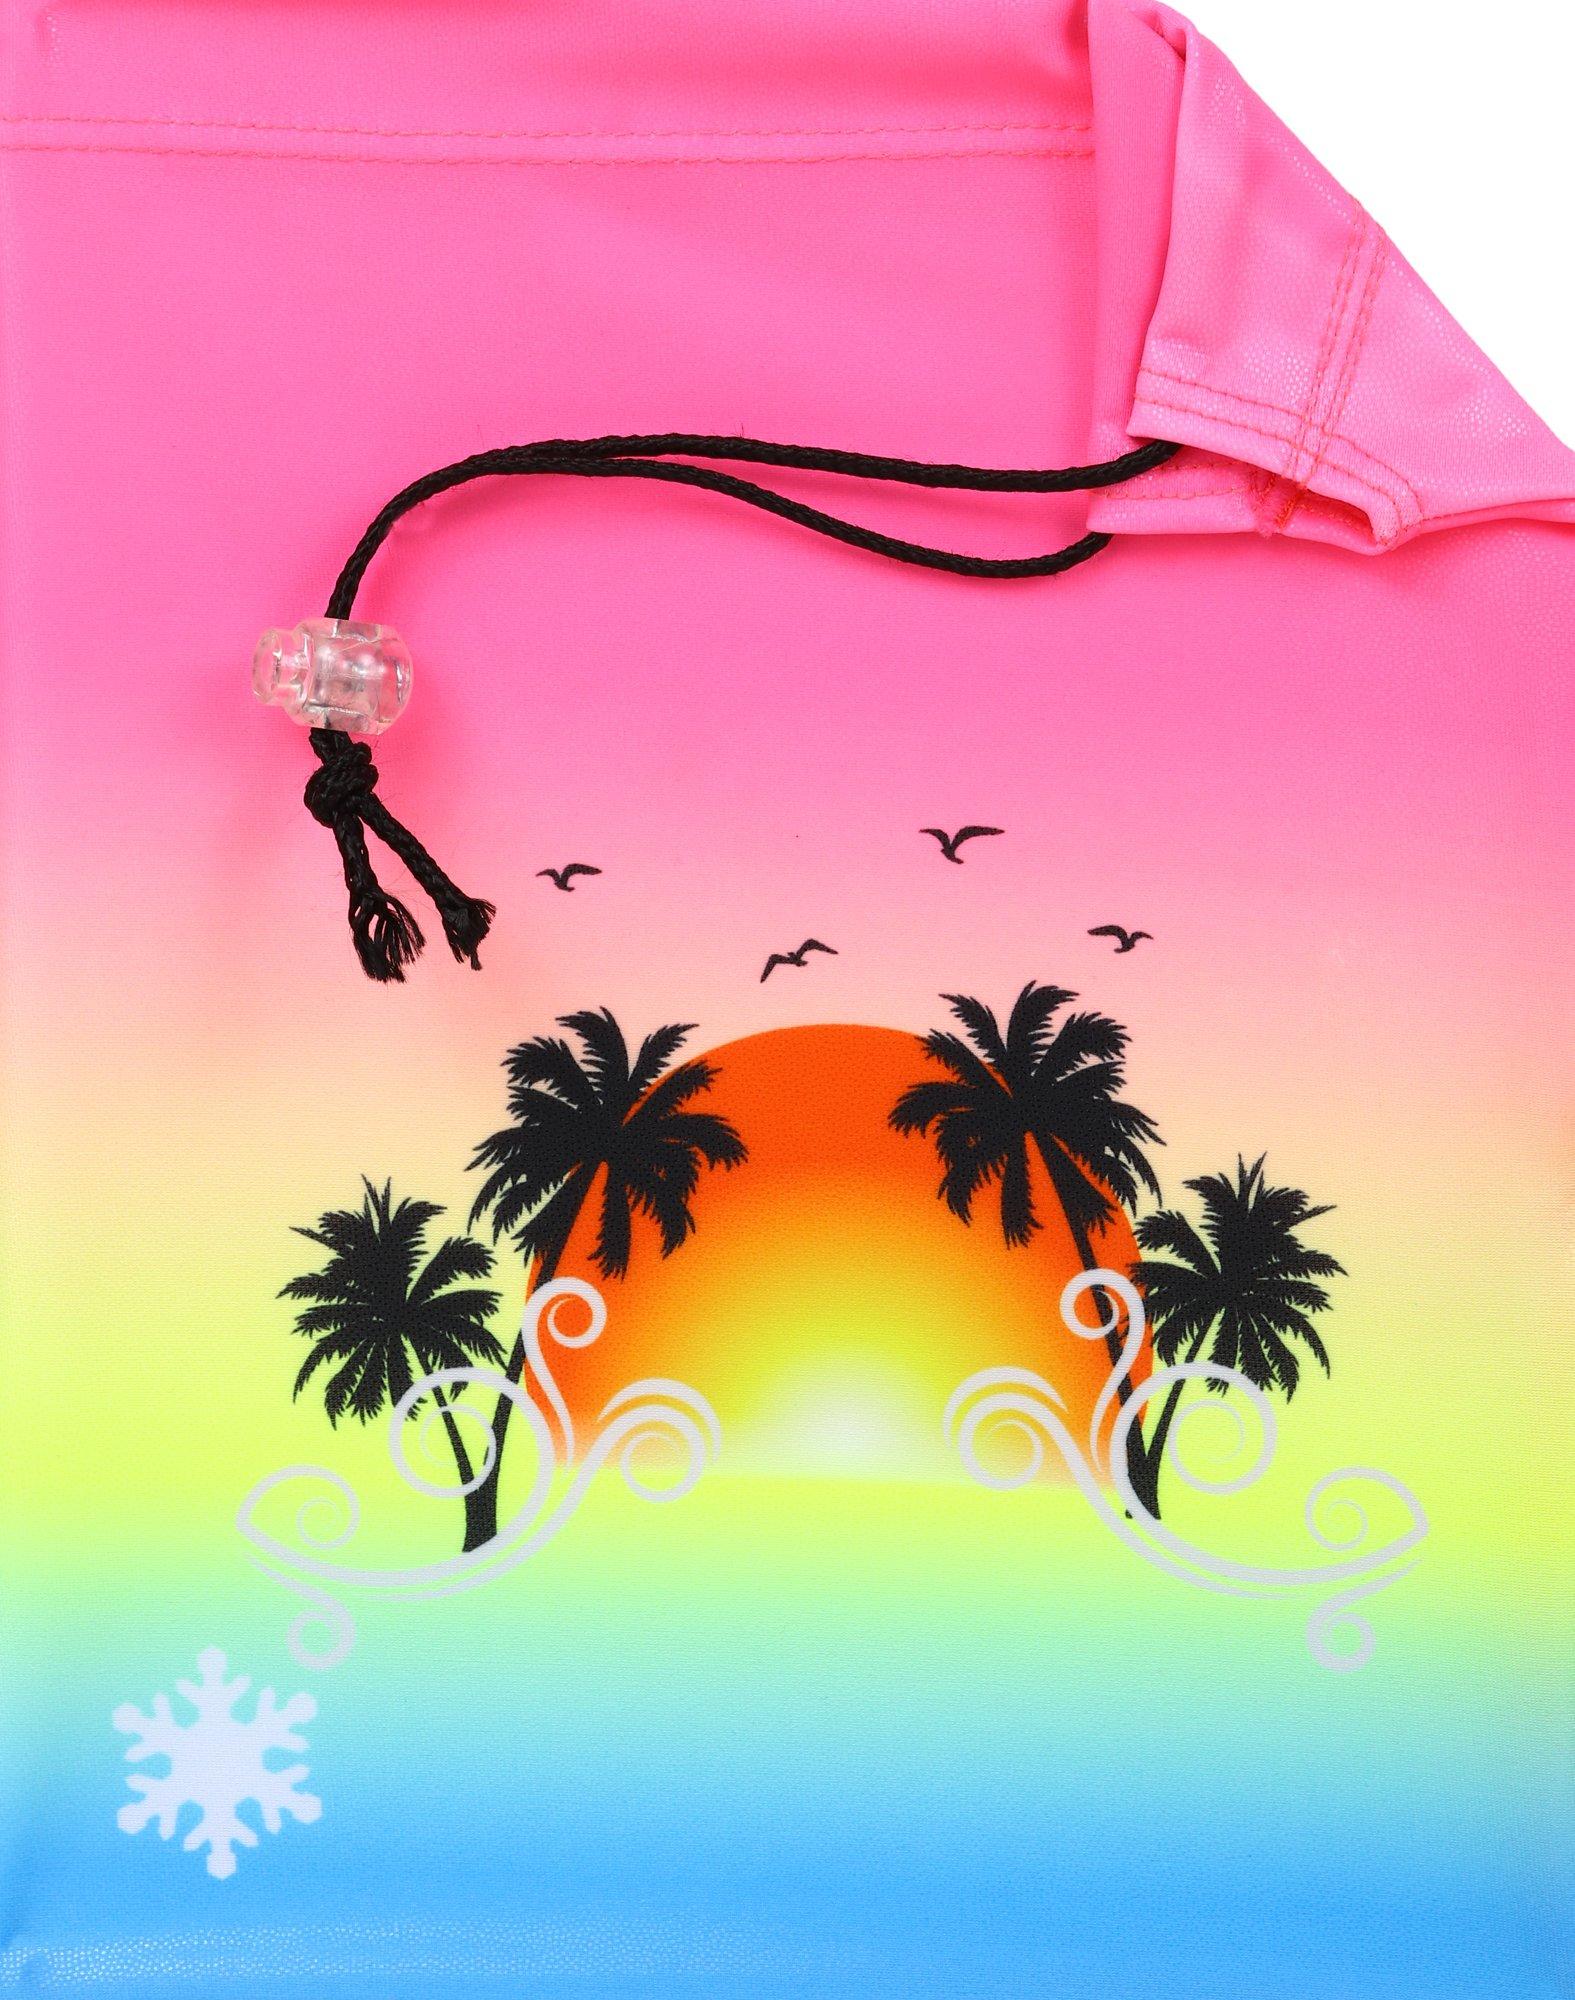 Snowflake Designs Beach Sunset Gymnastics Grip Bag